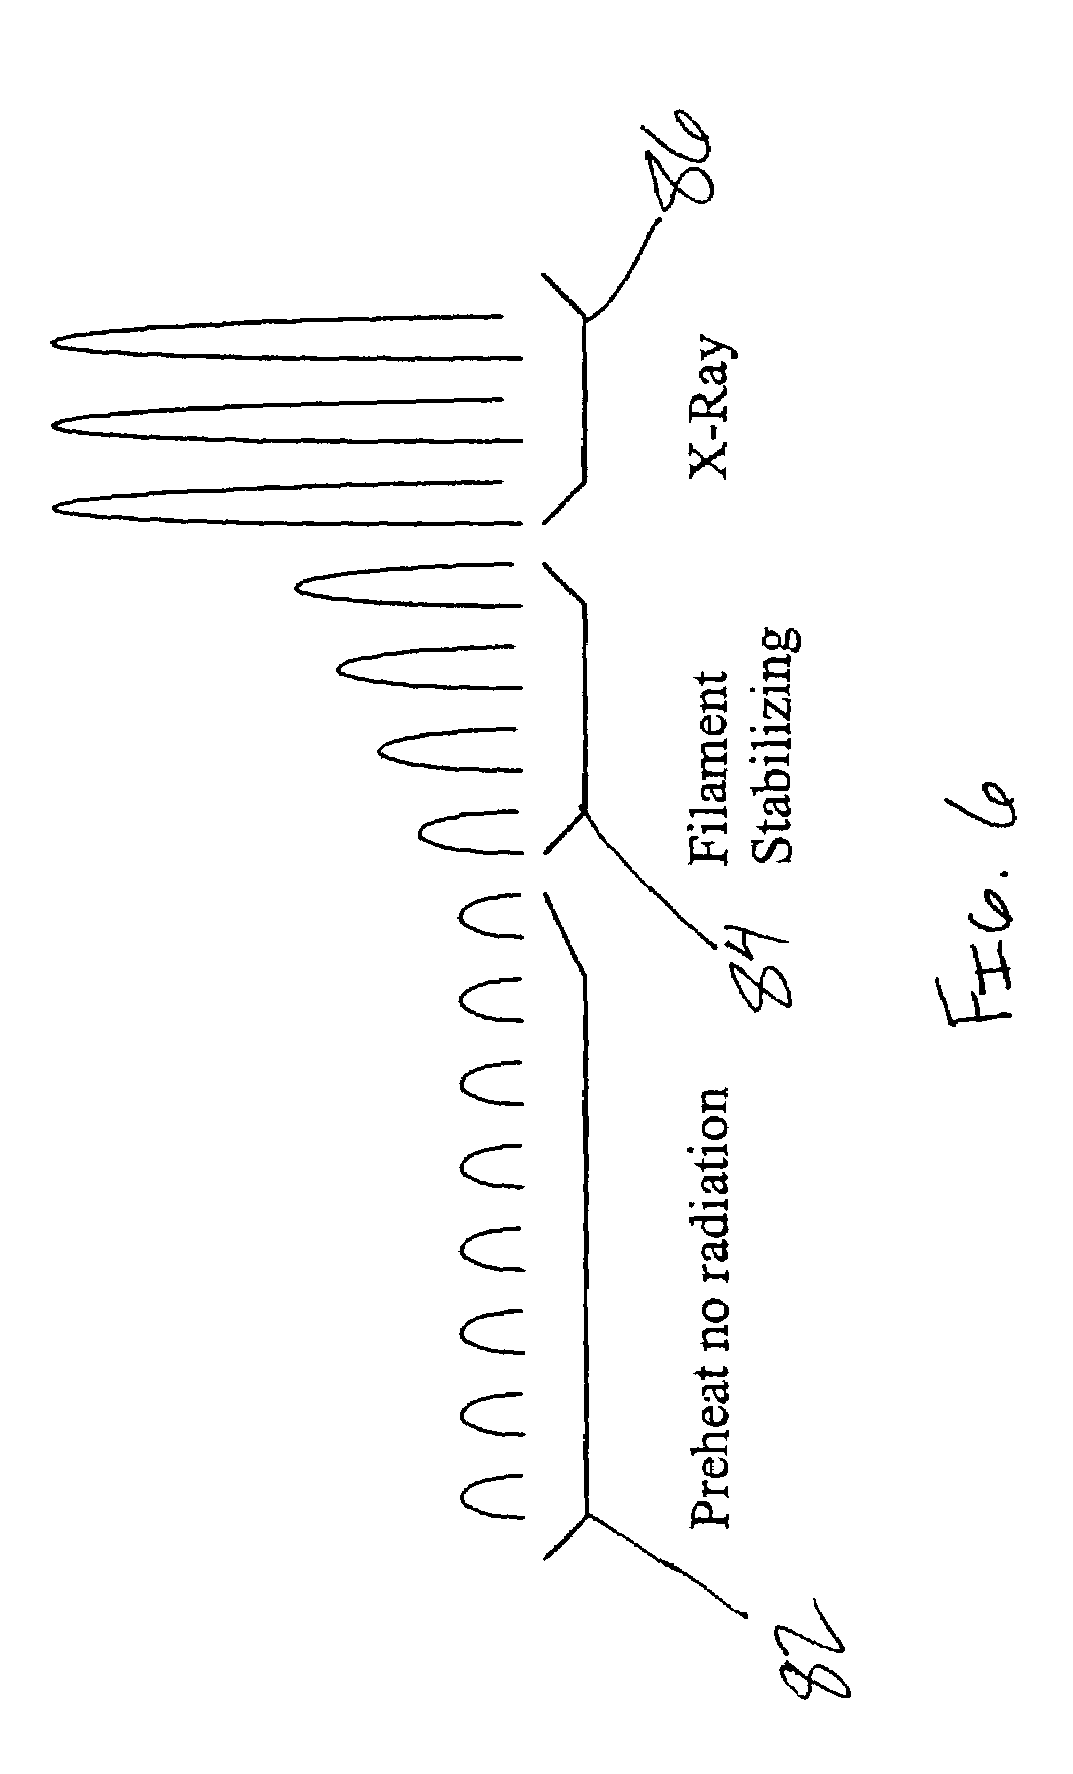 patent us7016468 - x-ray tube preheat control